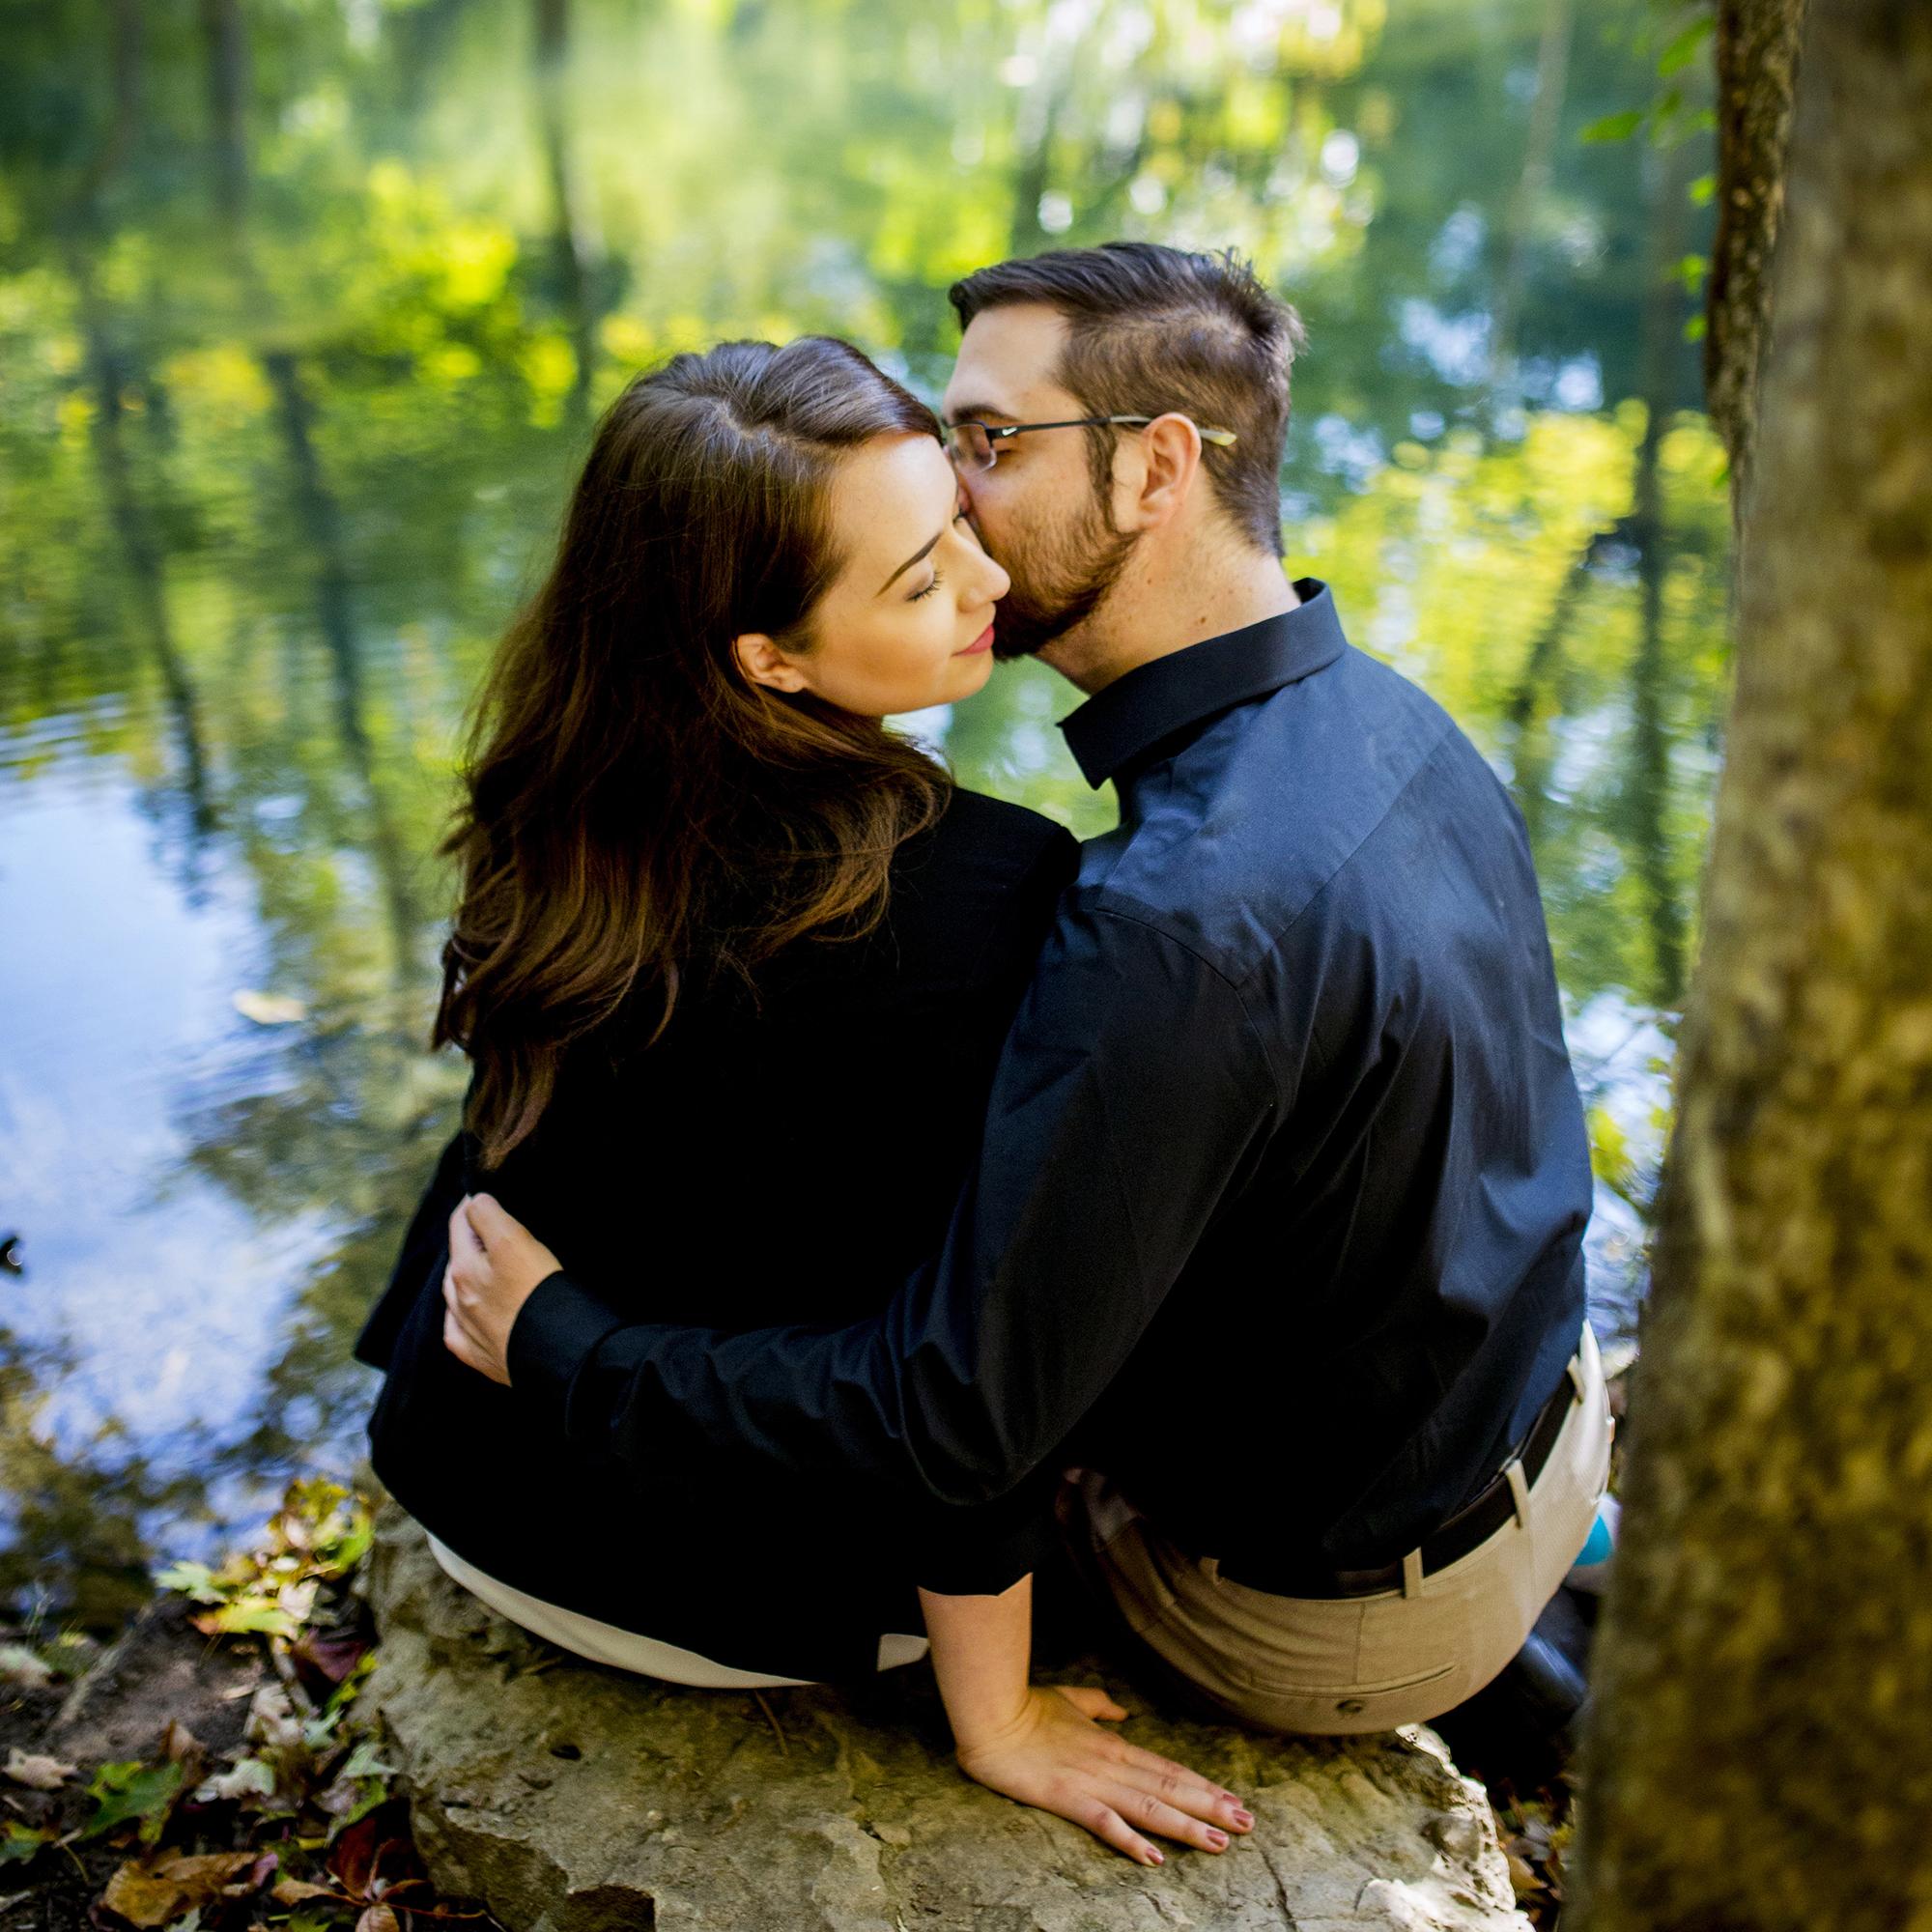 Seriously_Sabrina_Photography_Louisville_Kentucky_Engagement_Falls_of_Ohio_Seneca_Park_KarlMarlie43.jpg